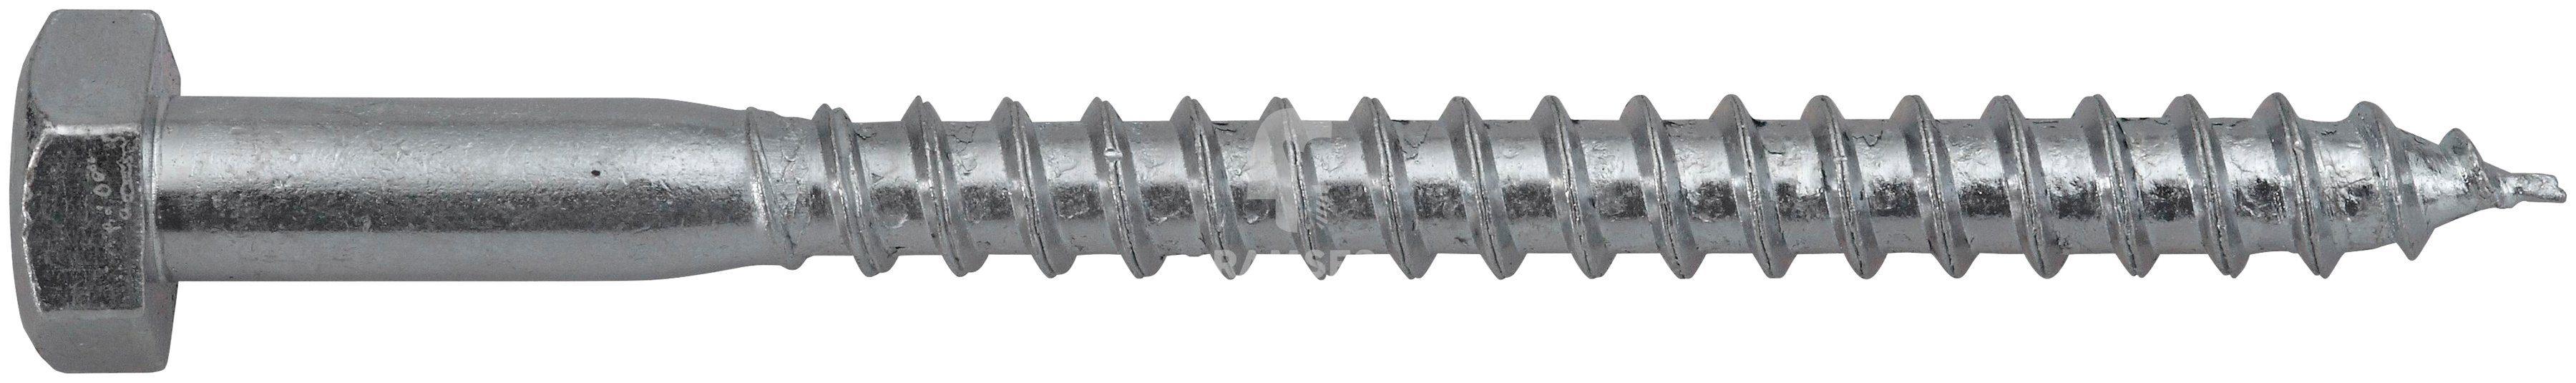 RAMSES Schrauben , Sechskant-Holzschraube 12 x 120 mm 12 Stk.